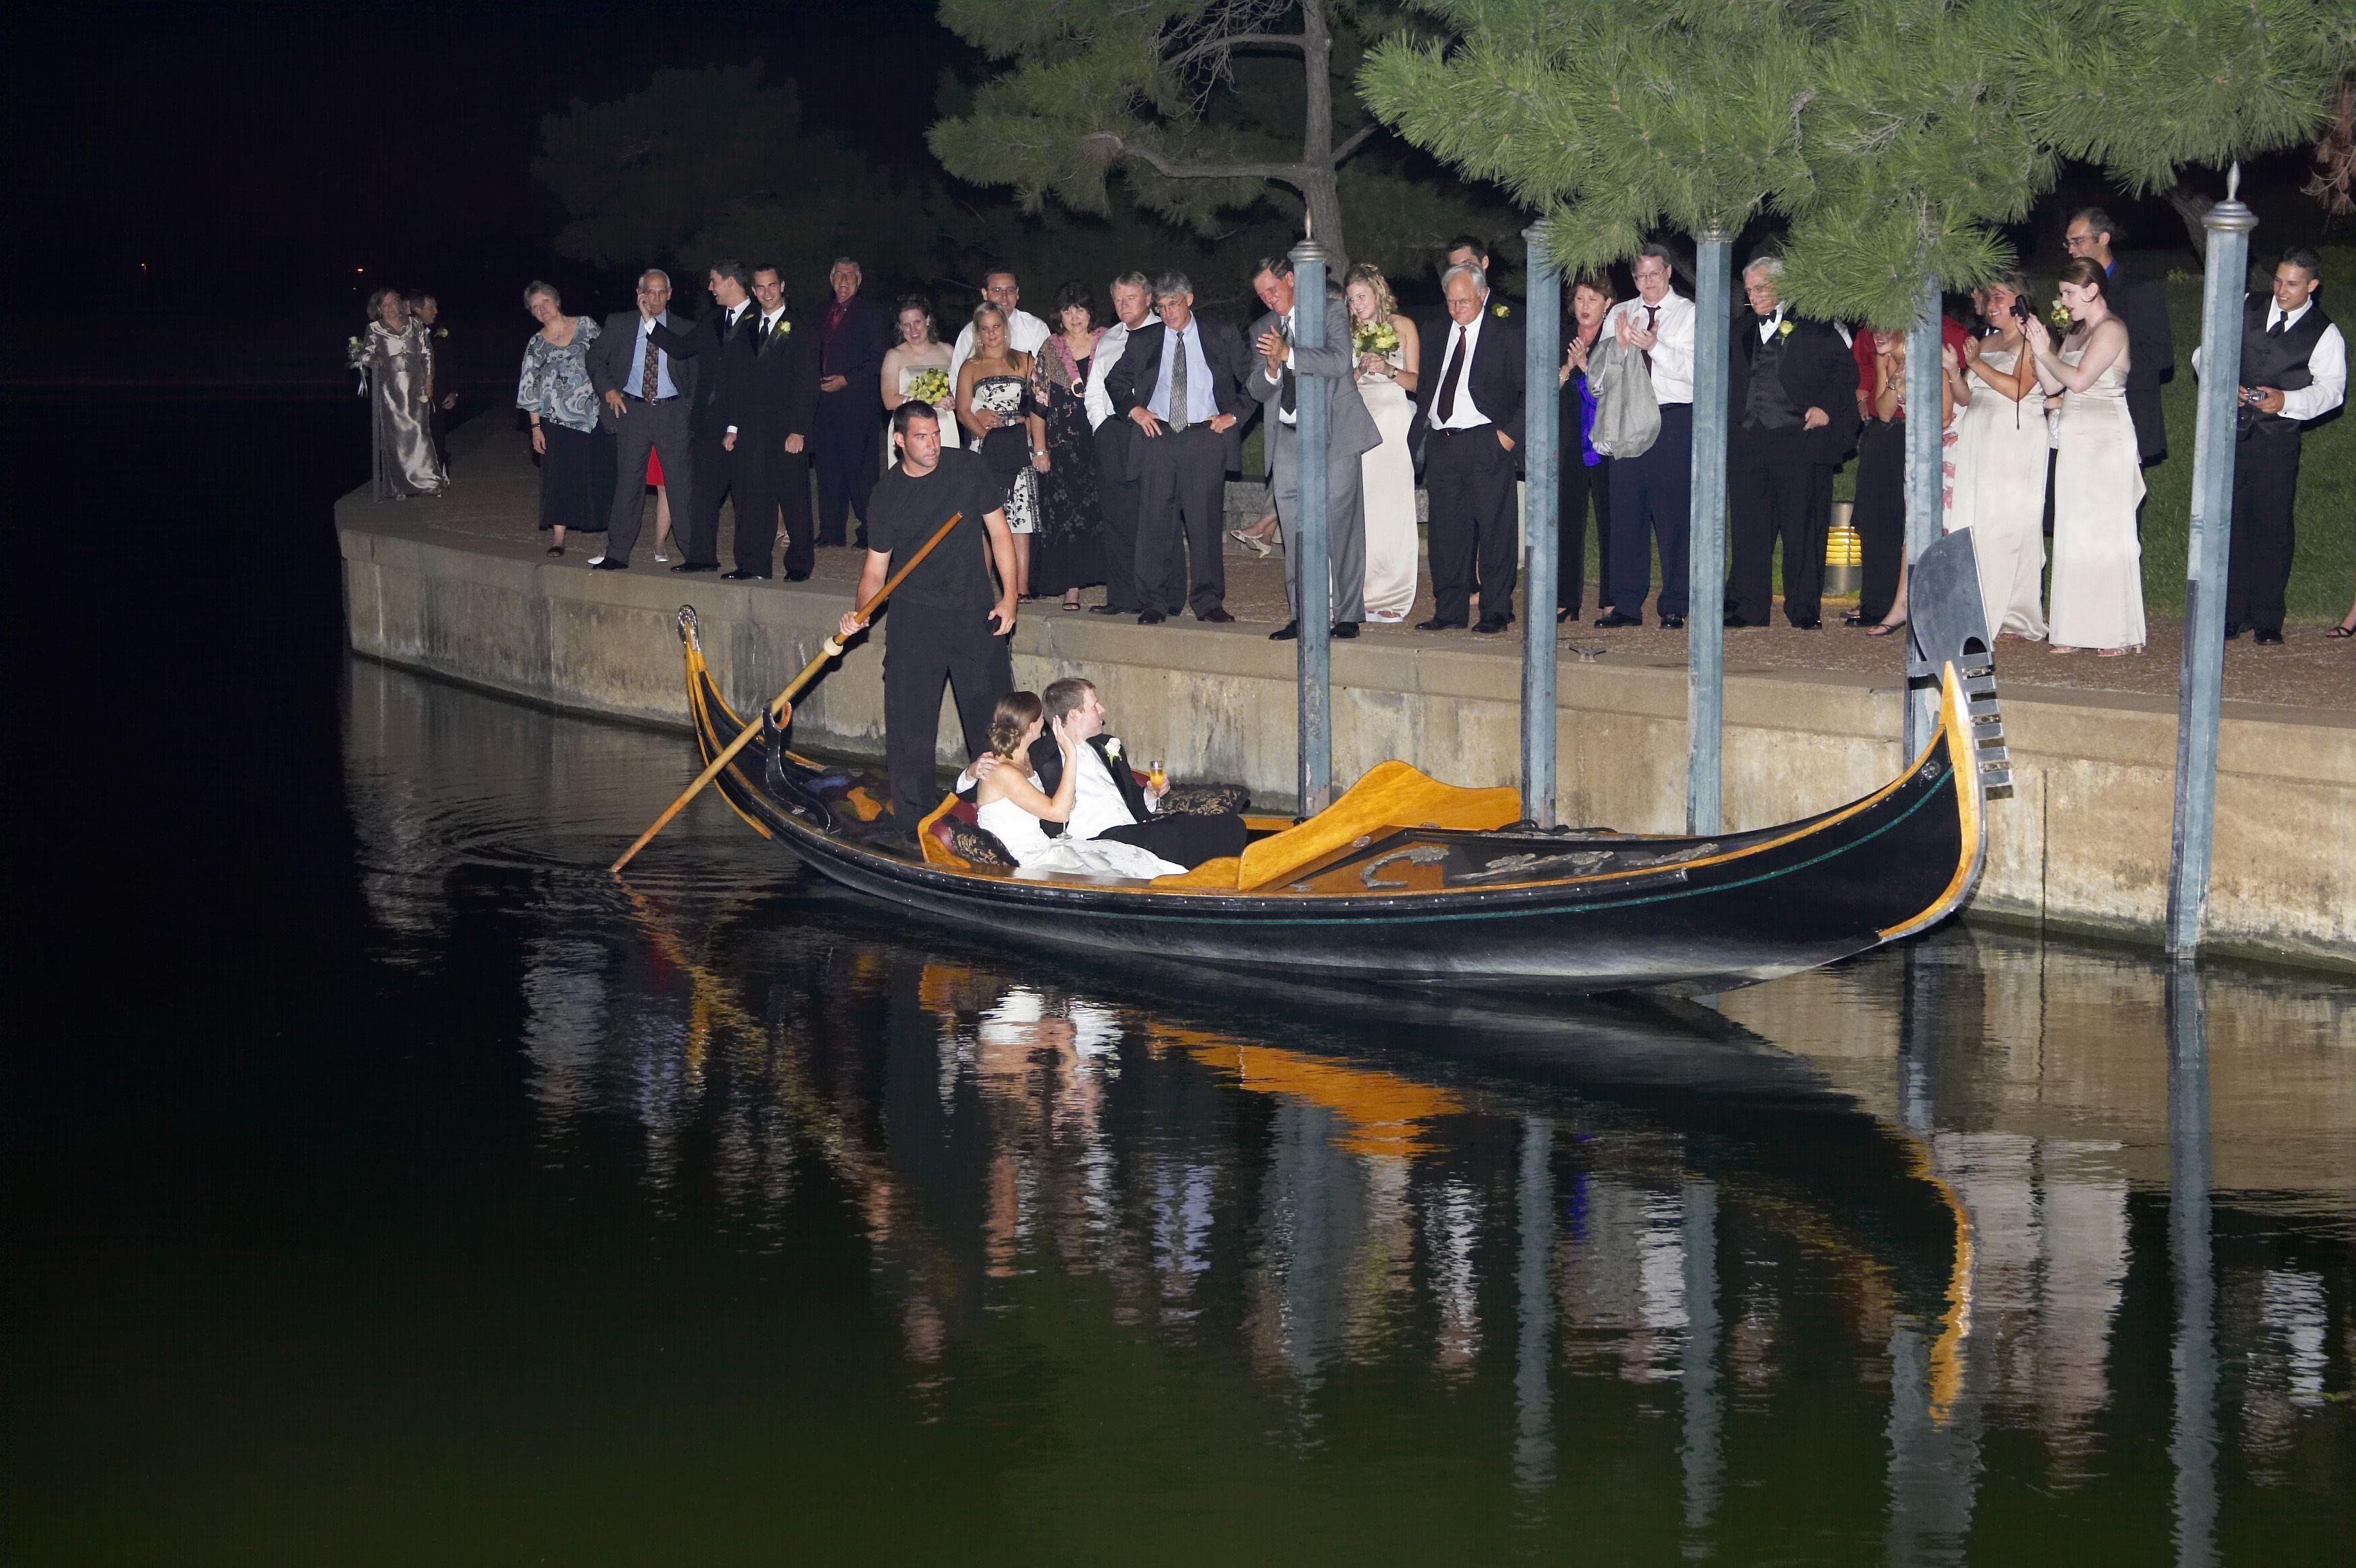 Gondola Departure From Wedding At La Cima Club In Las Colinas Photo By Cherished Memories